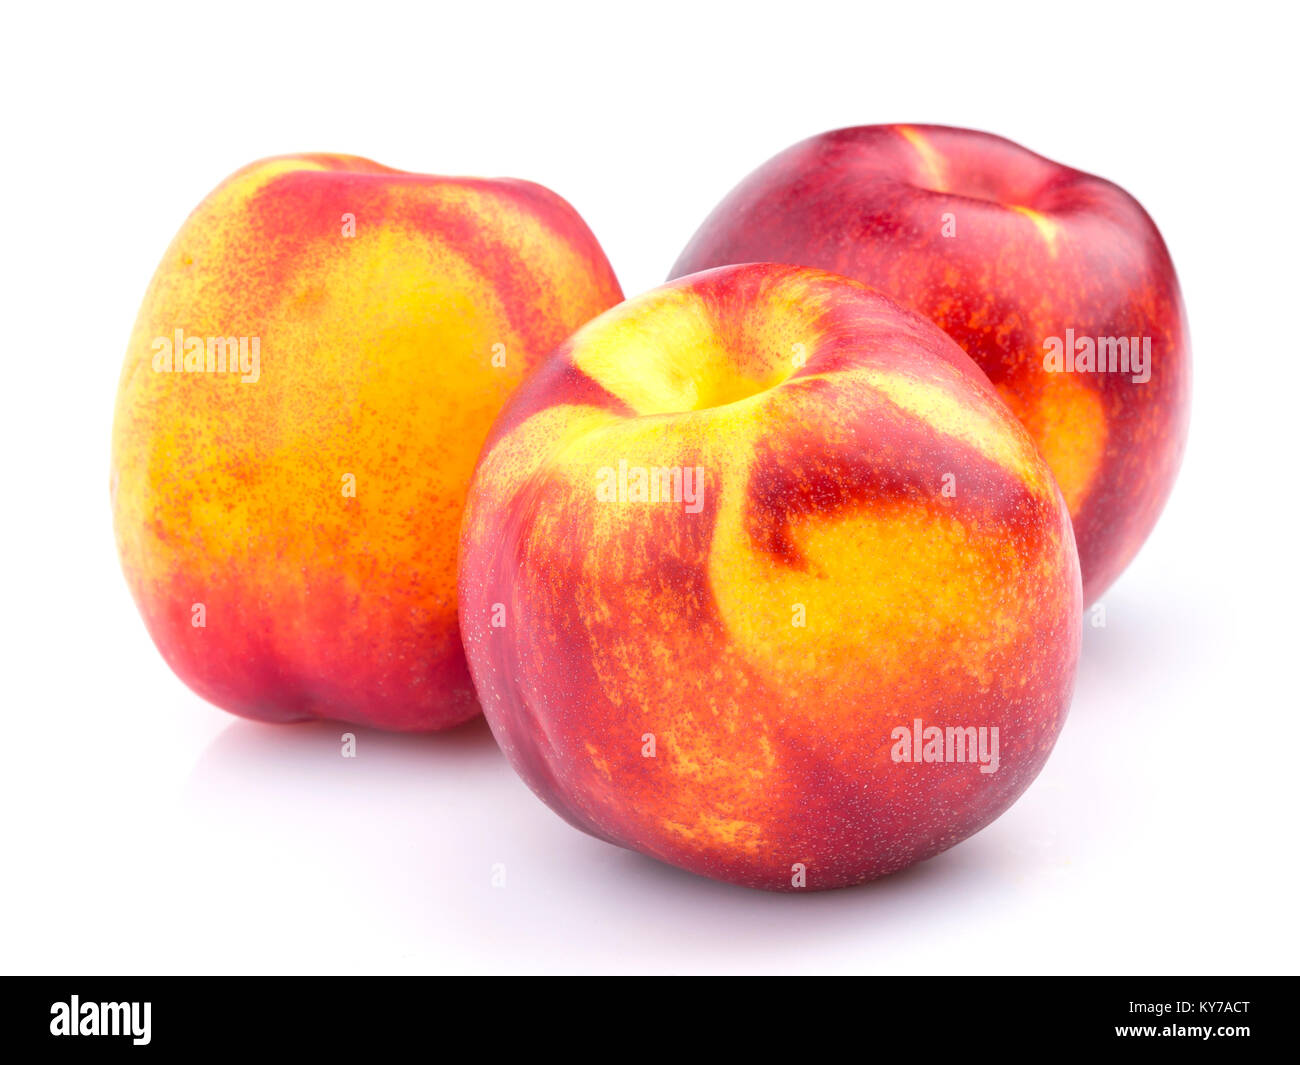 Toda la nectarina fruto aislado sobre fondo blanco. Imagen De Stock